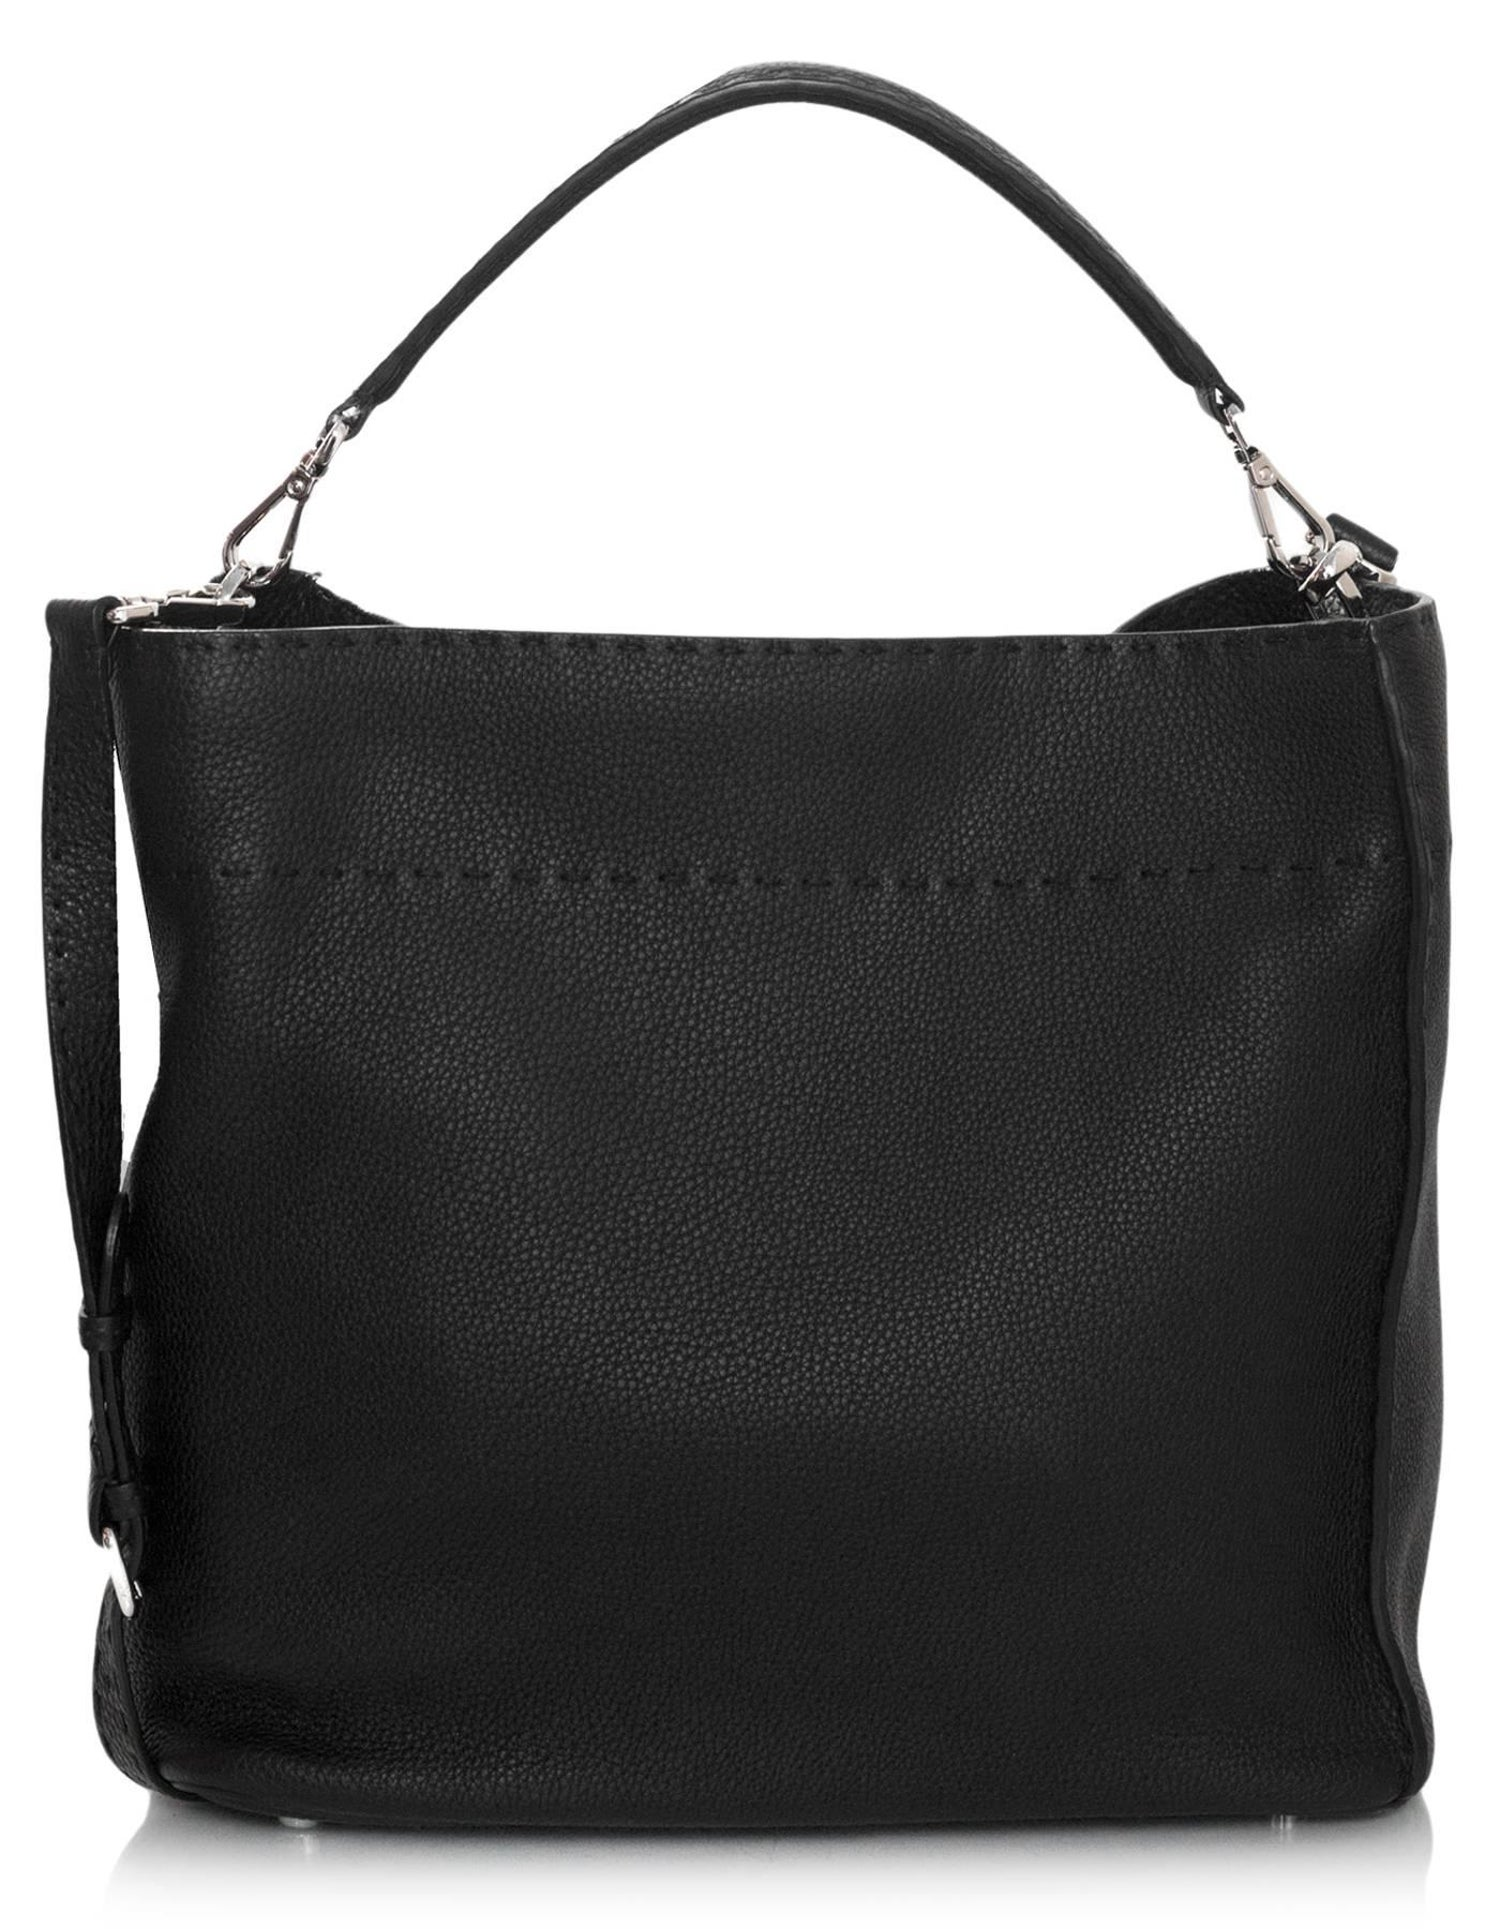 8e02780b8a Fendi Black Selleria Leather Anna Hobo Bag For Sale at 1stdibs